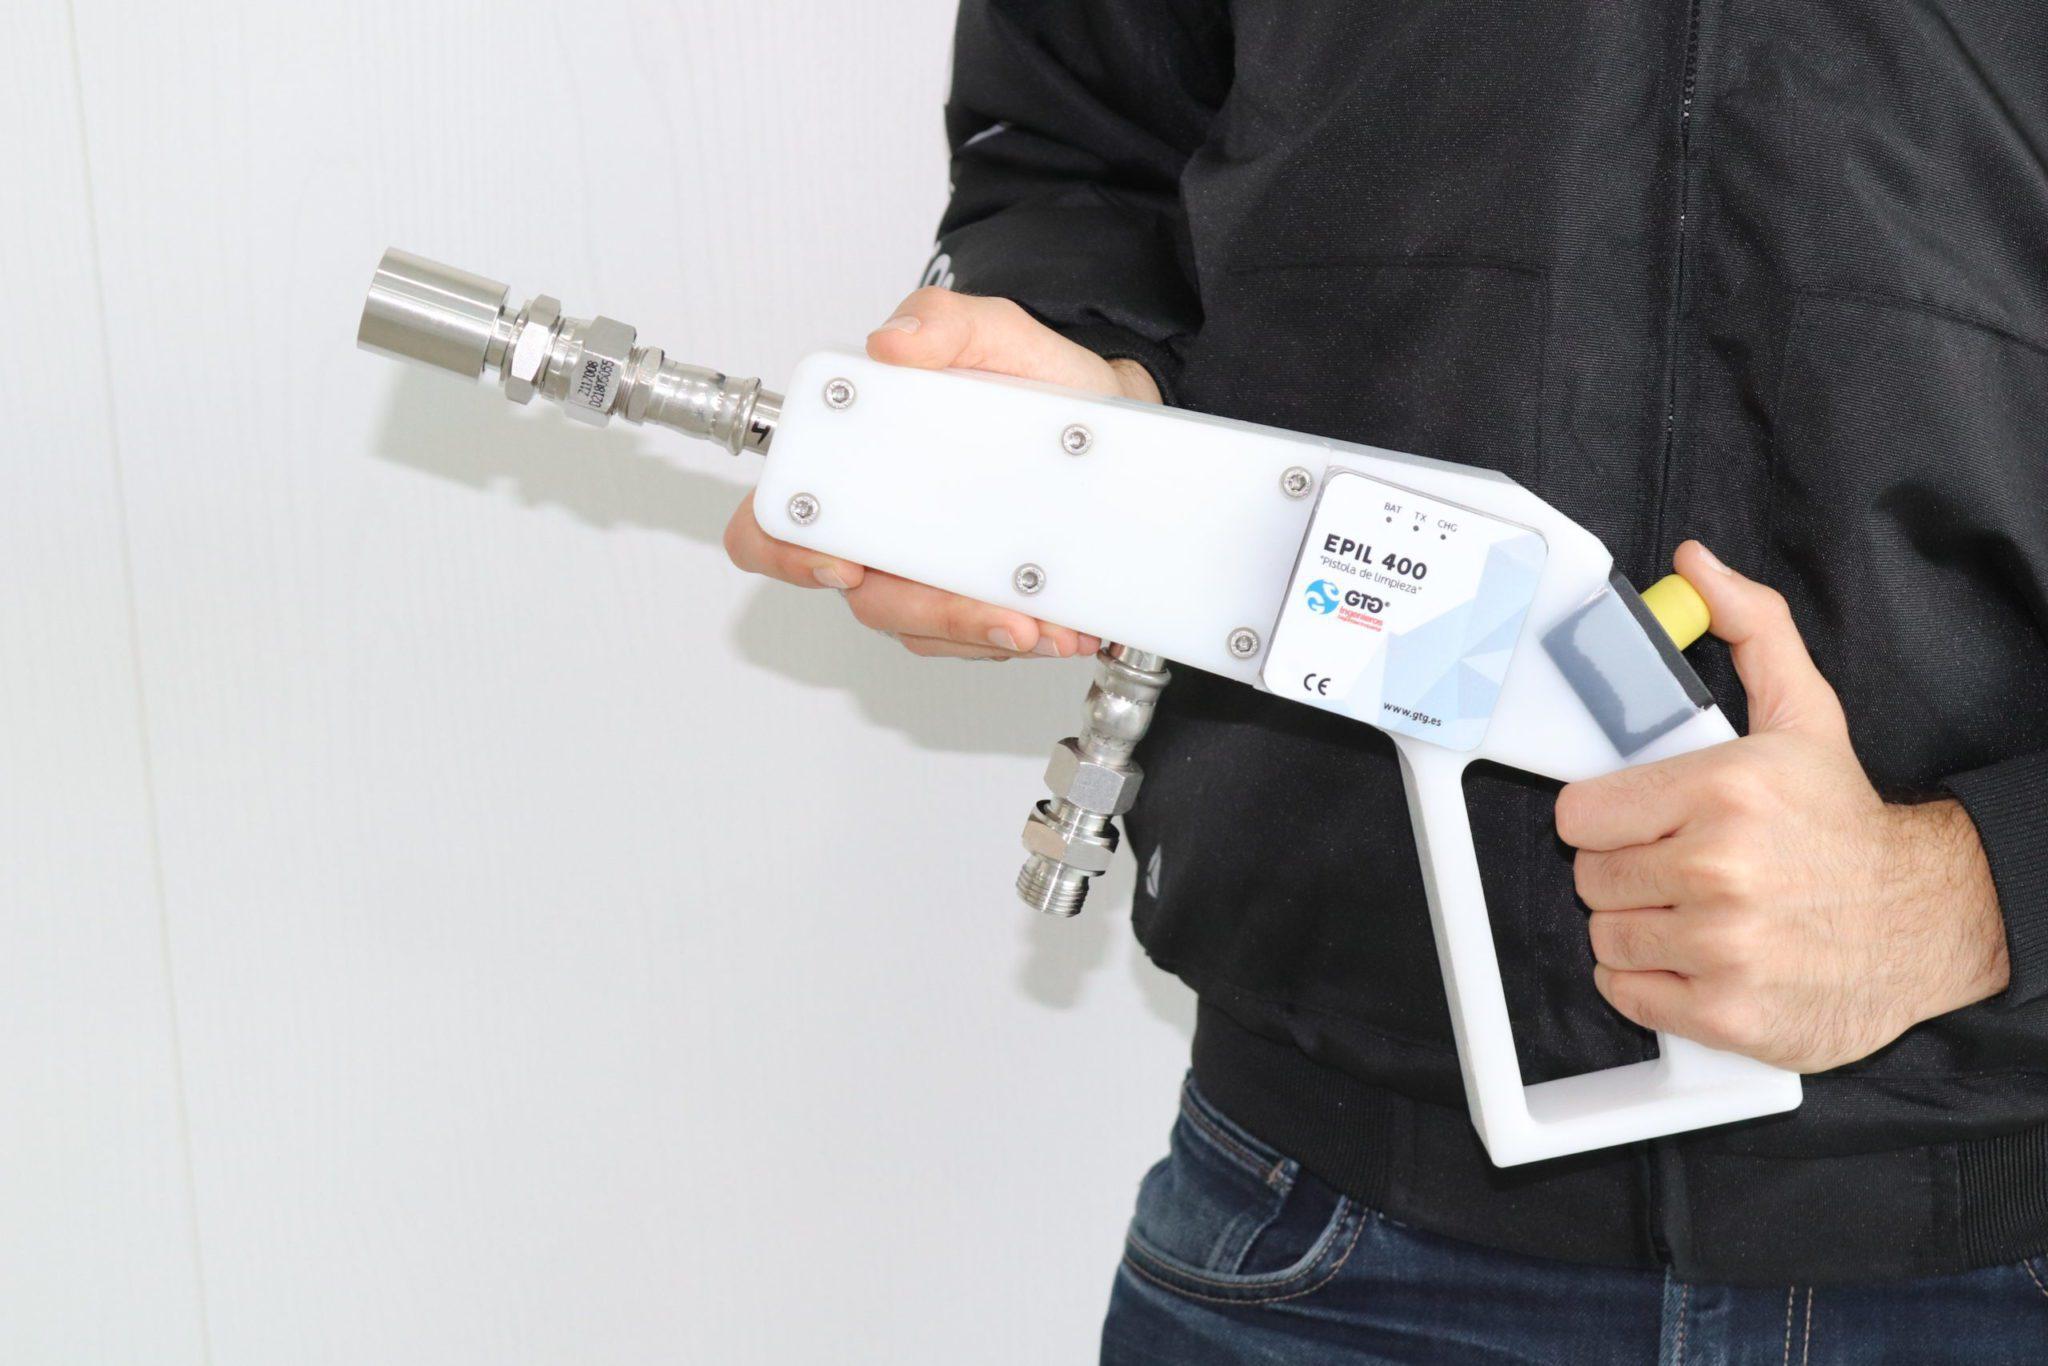 EPIL Pistola de limpieza